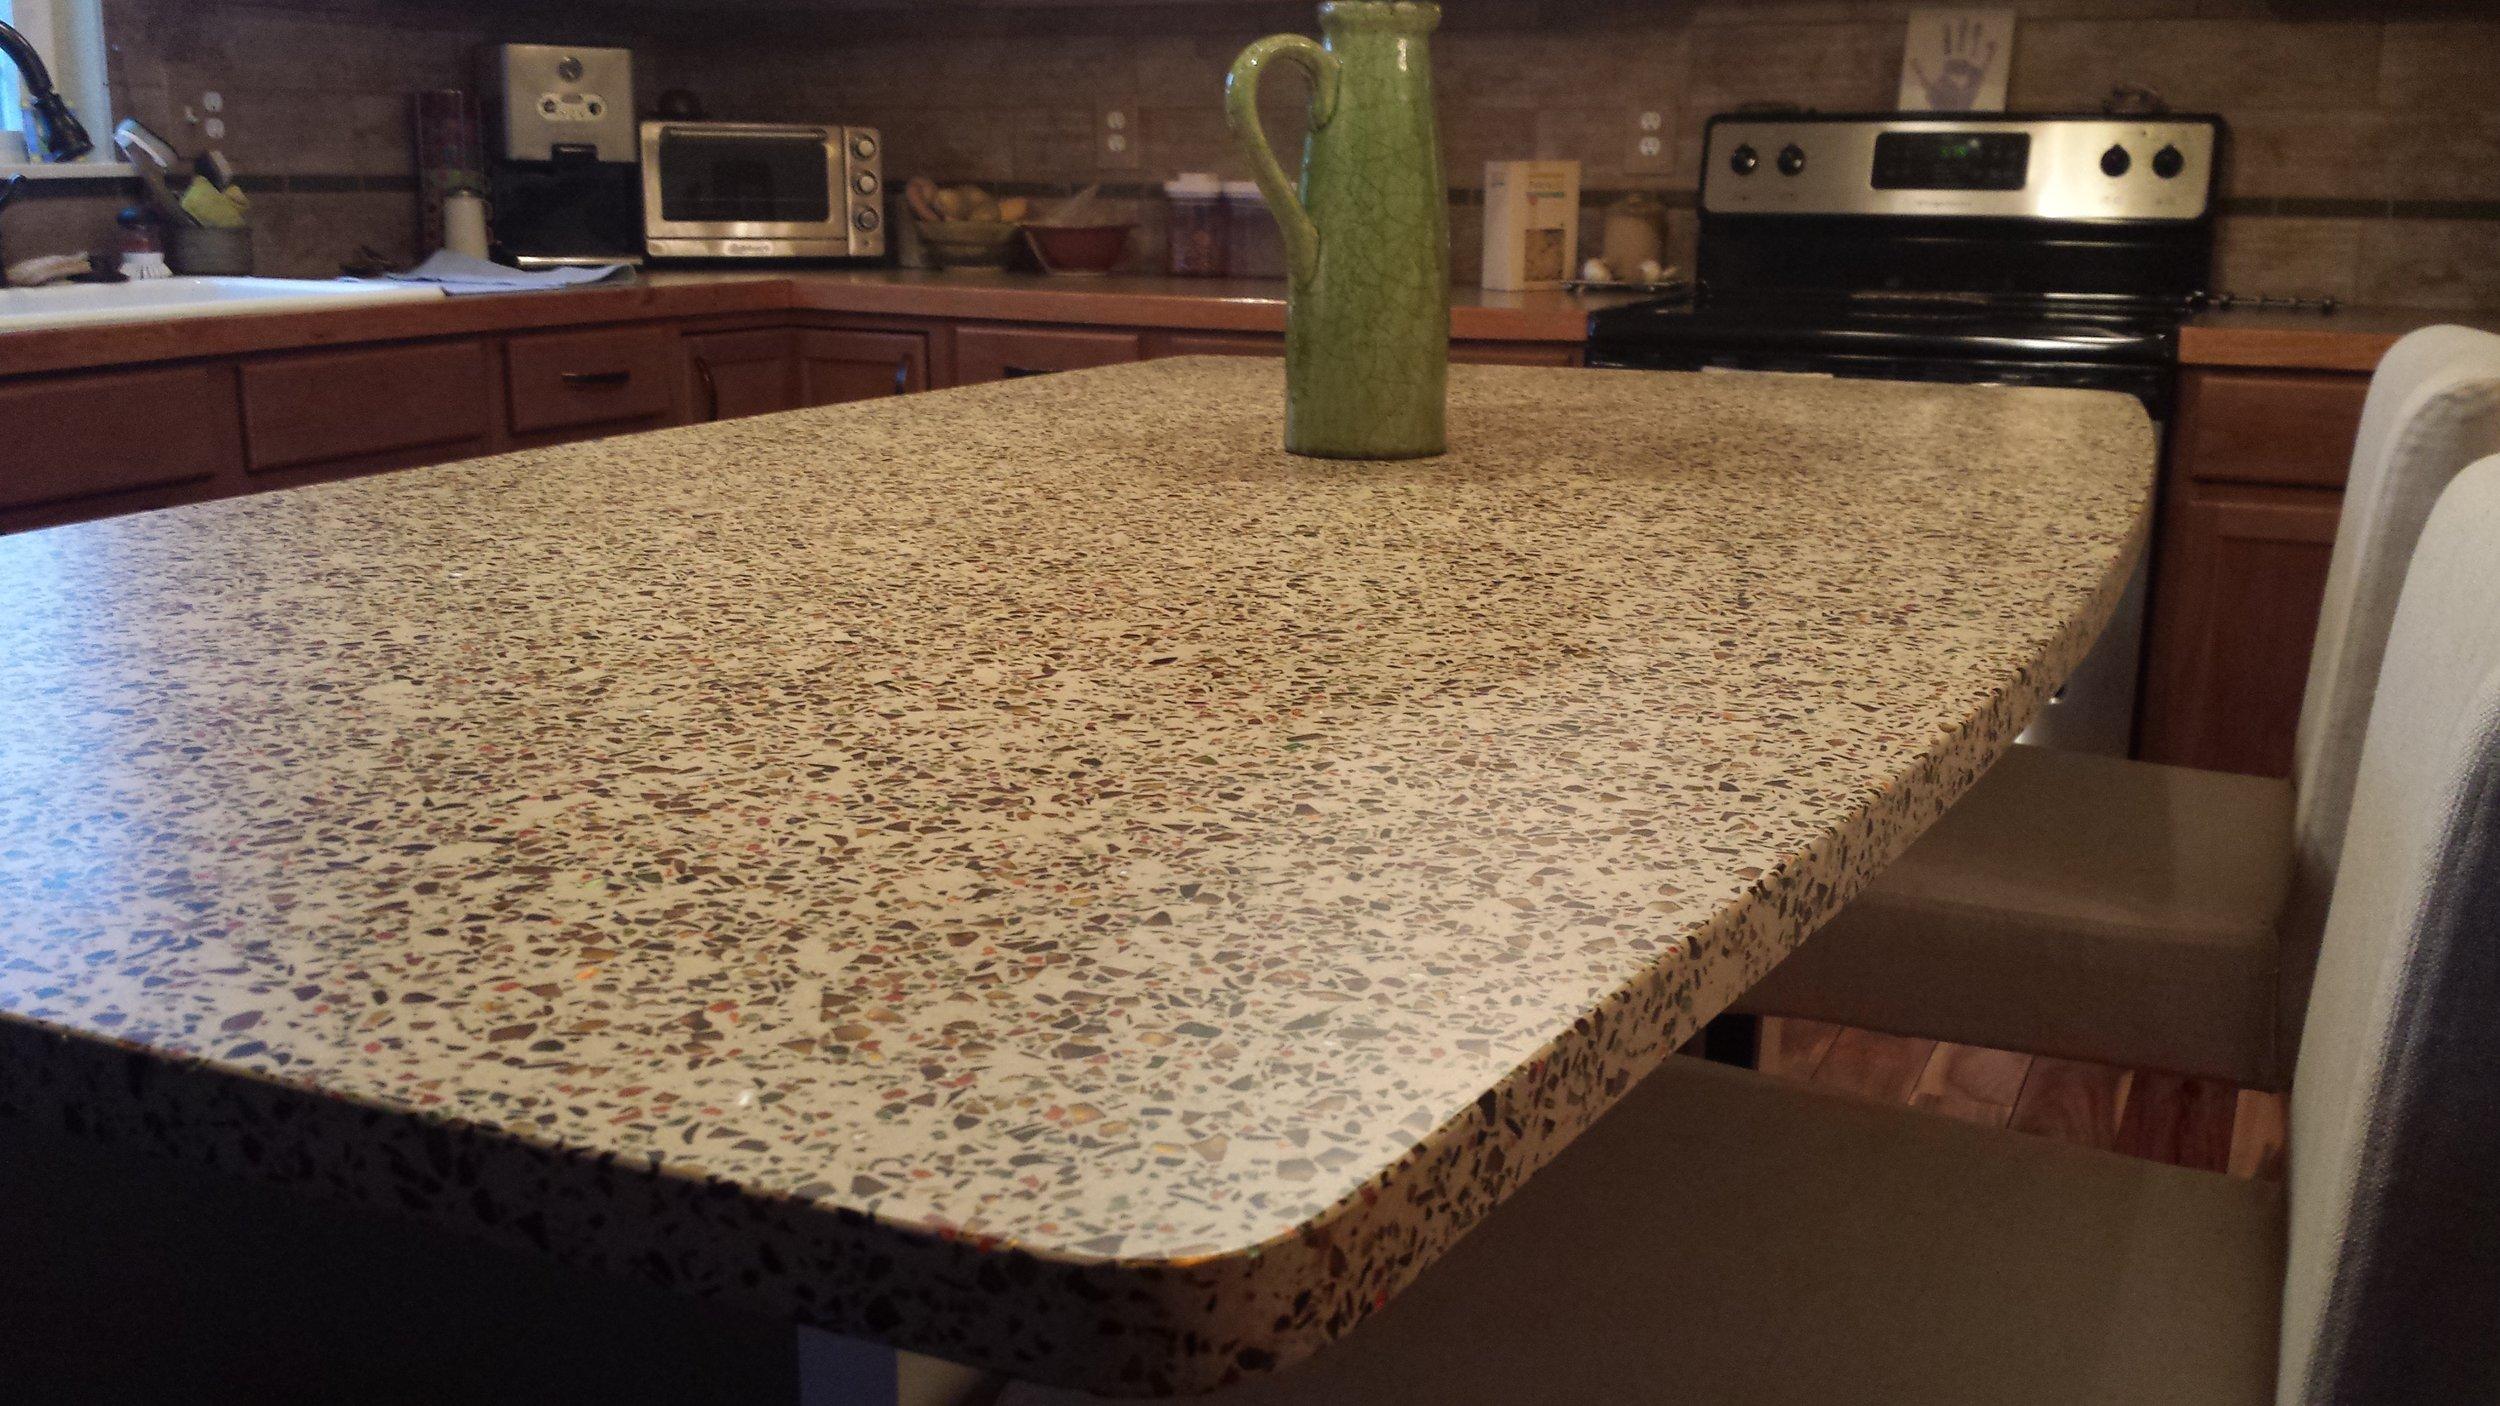 greyrockconcrete_customcountertops_aggregate_kitchen_concrete_countertops_customconcretecolorado_greyrock_3.jpg